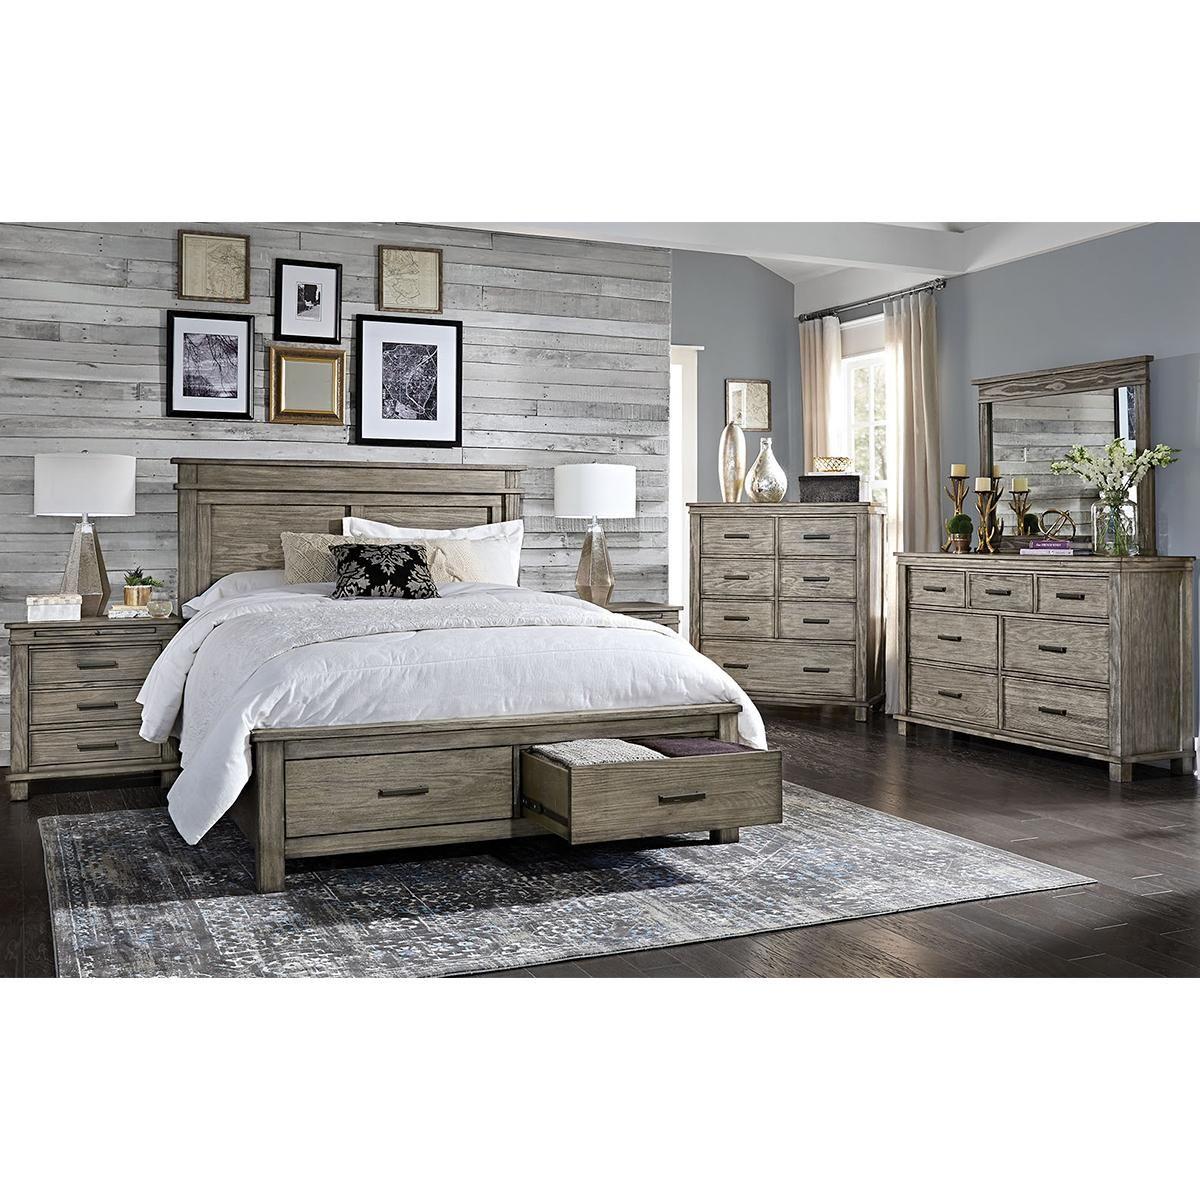 Best Glacier Point 4 Piece King Bedroom Set In Grey Stone 400 x 300